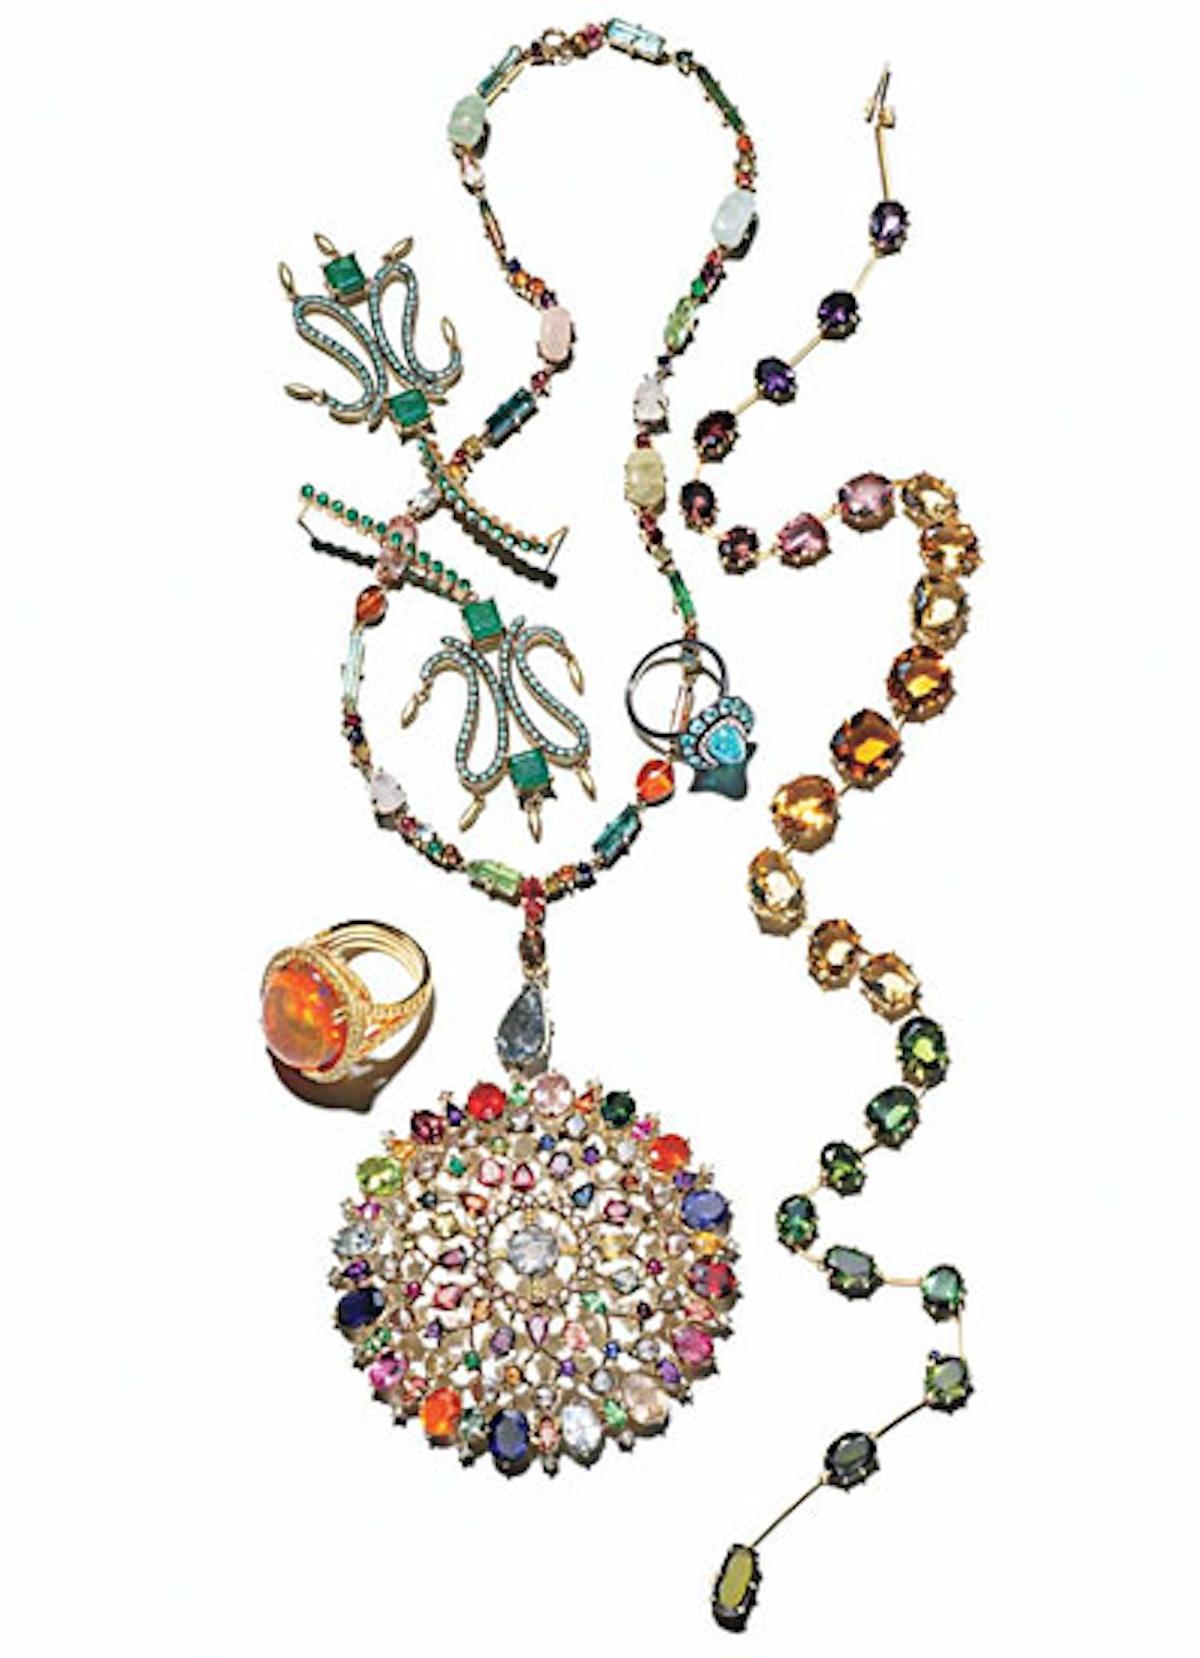 acss_brightjewelry_v.jpg